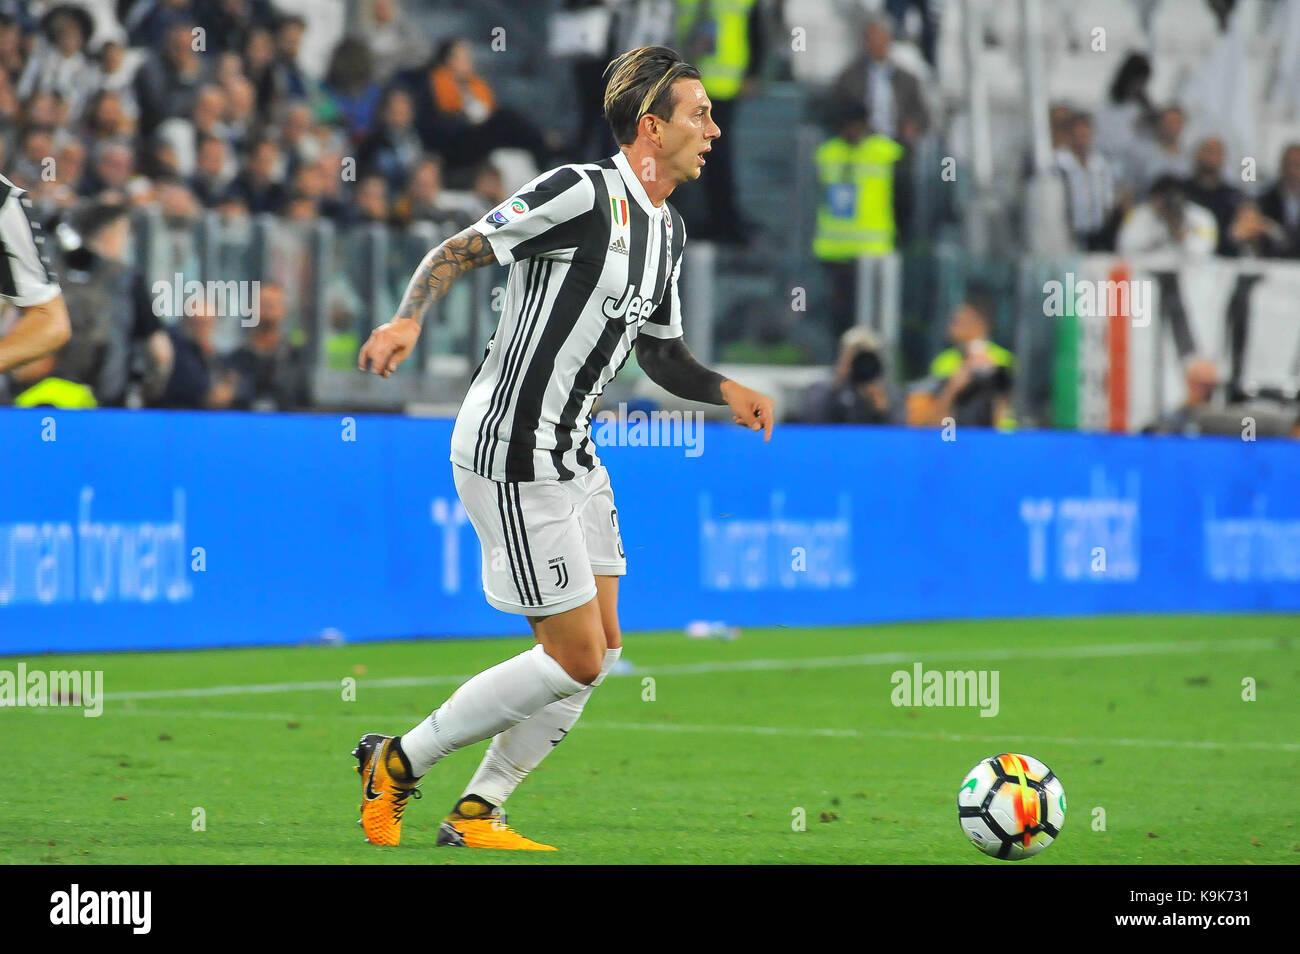 Federico Bernardeschi Juventus FC during the Serie A football